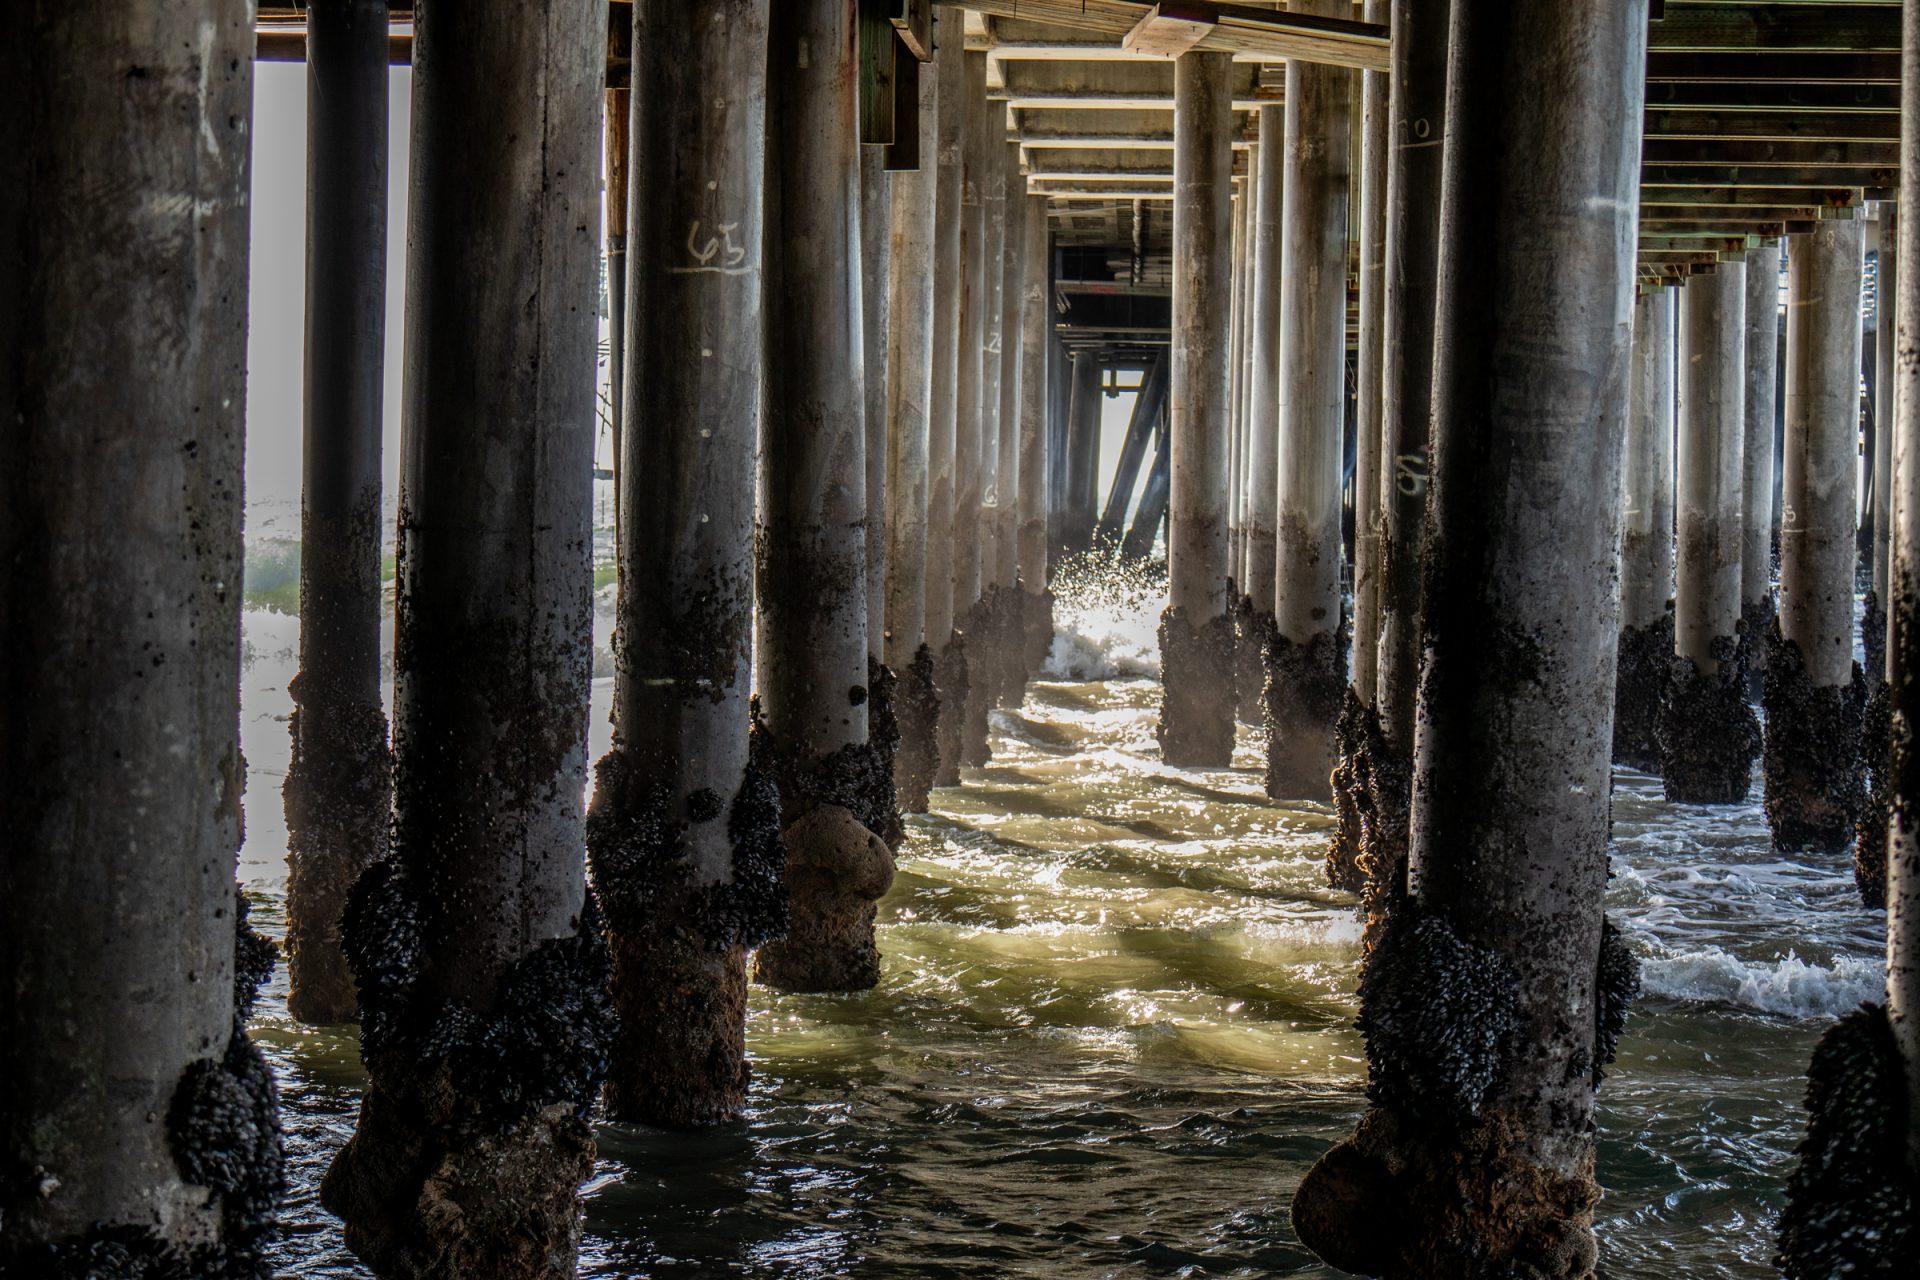 Small Waves Crashing On Barnacles Covered Columns